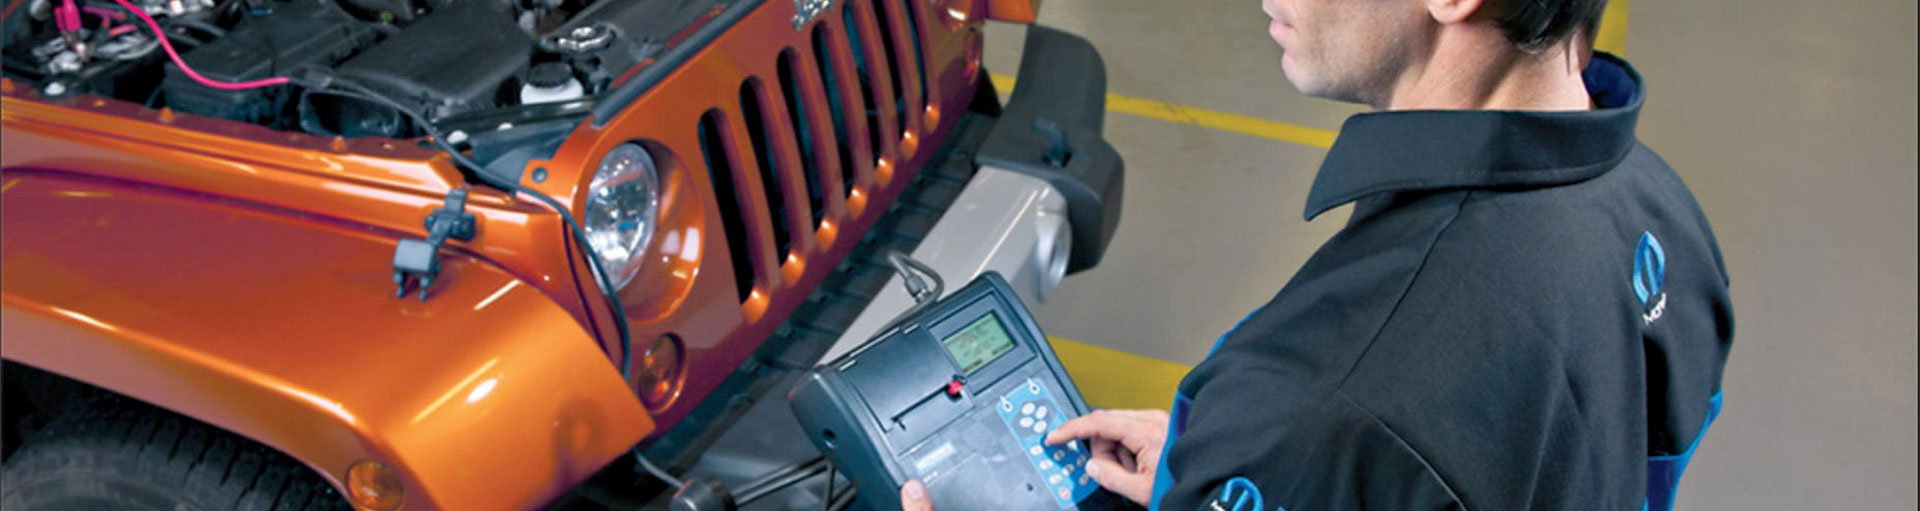 Monrovia Chrysler Dodge Jeep Ram Battery Service Department